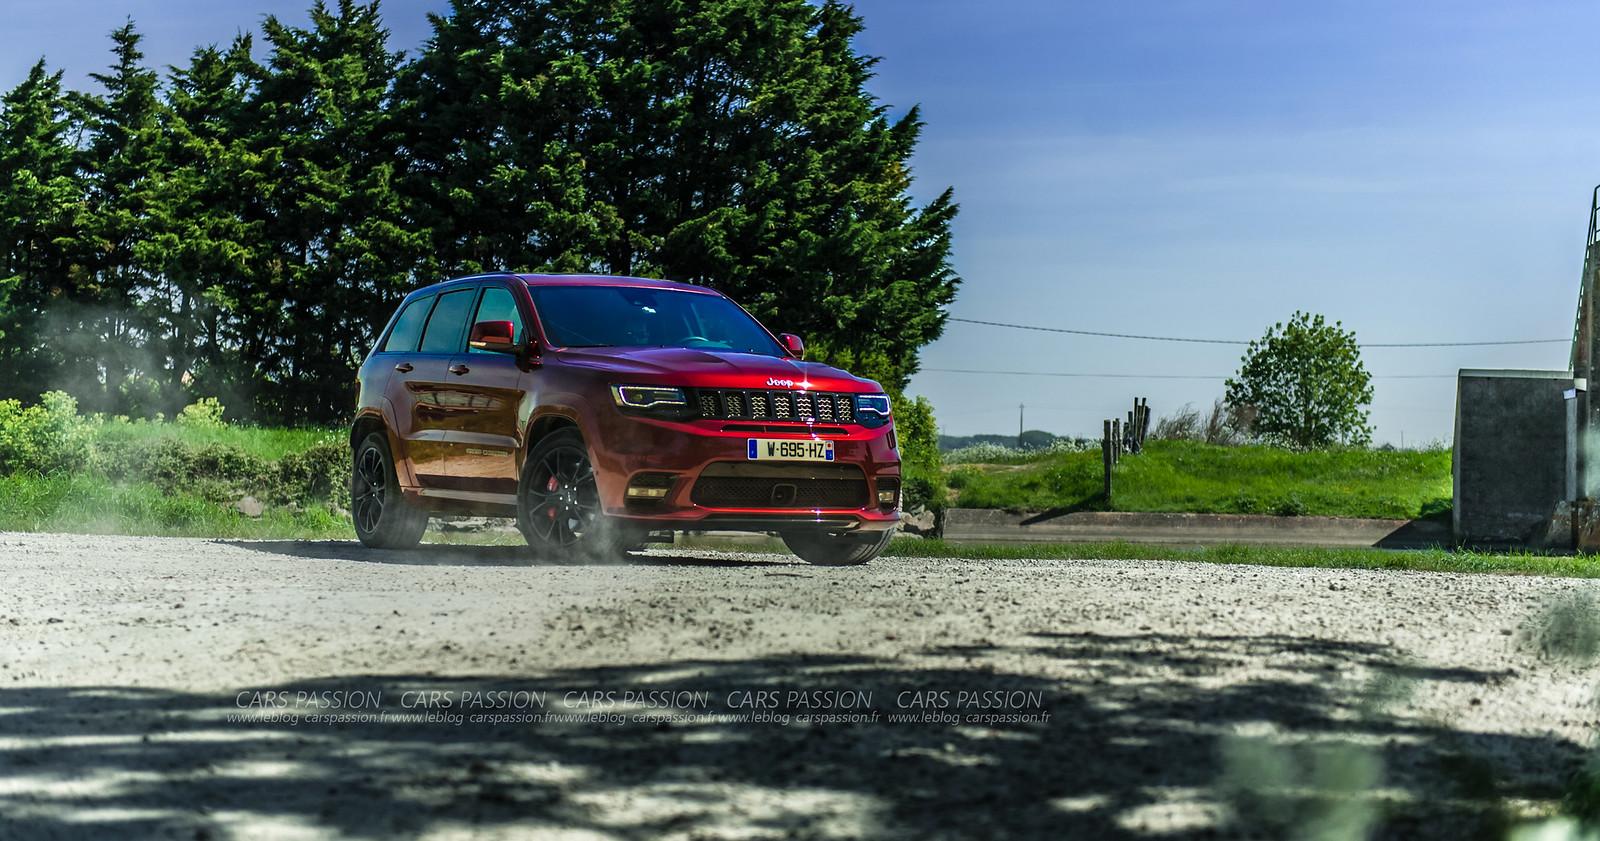 essai-jeep-garnd-cherokee-srt (3)